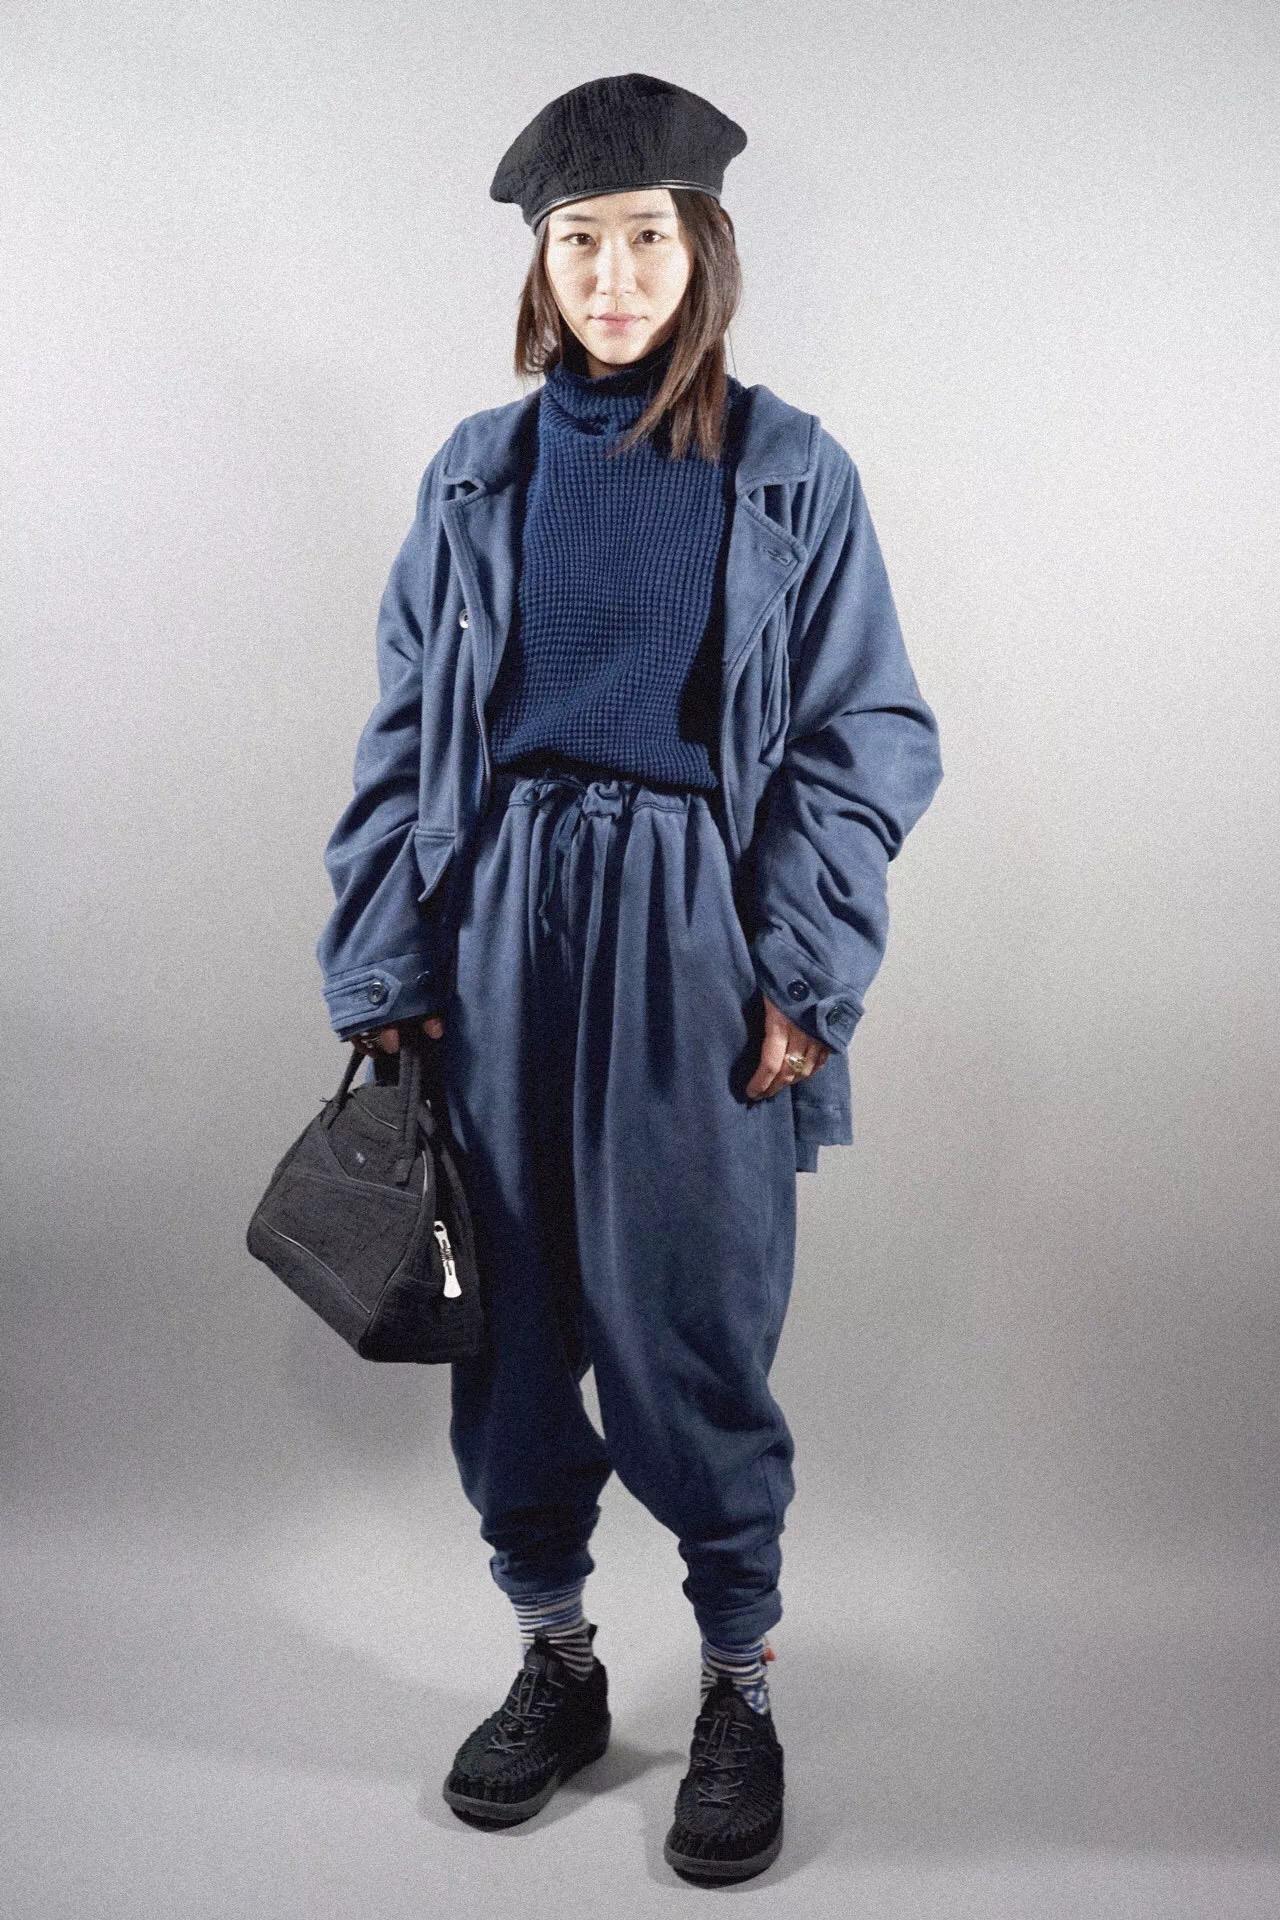 PC - AGING JACKET - BLUE PC - FRENCH THERMAL TURTLENECK - BLUE PC - AGING PANTS - BLUE PC - SASHIKO HAND BAG - PLATINUM RIVETS - BLACK